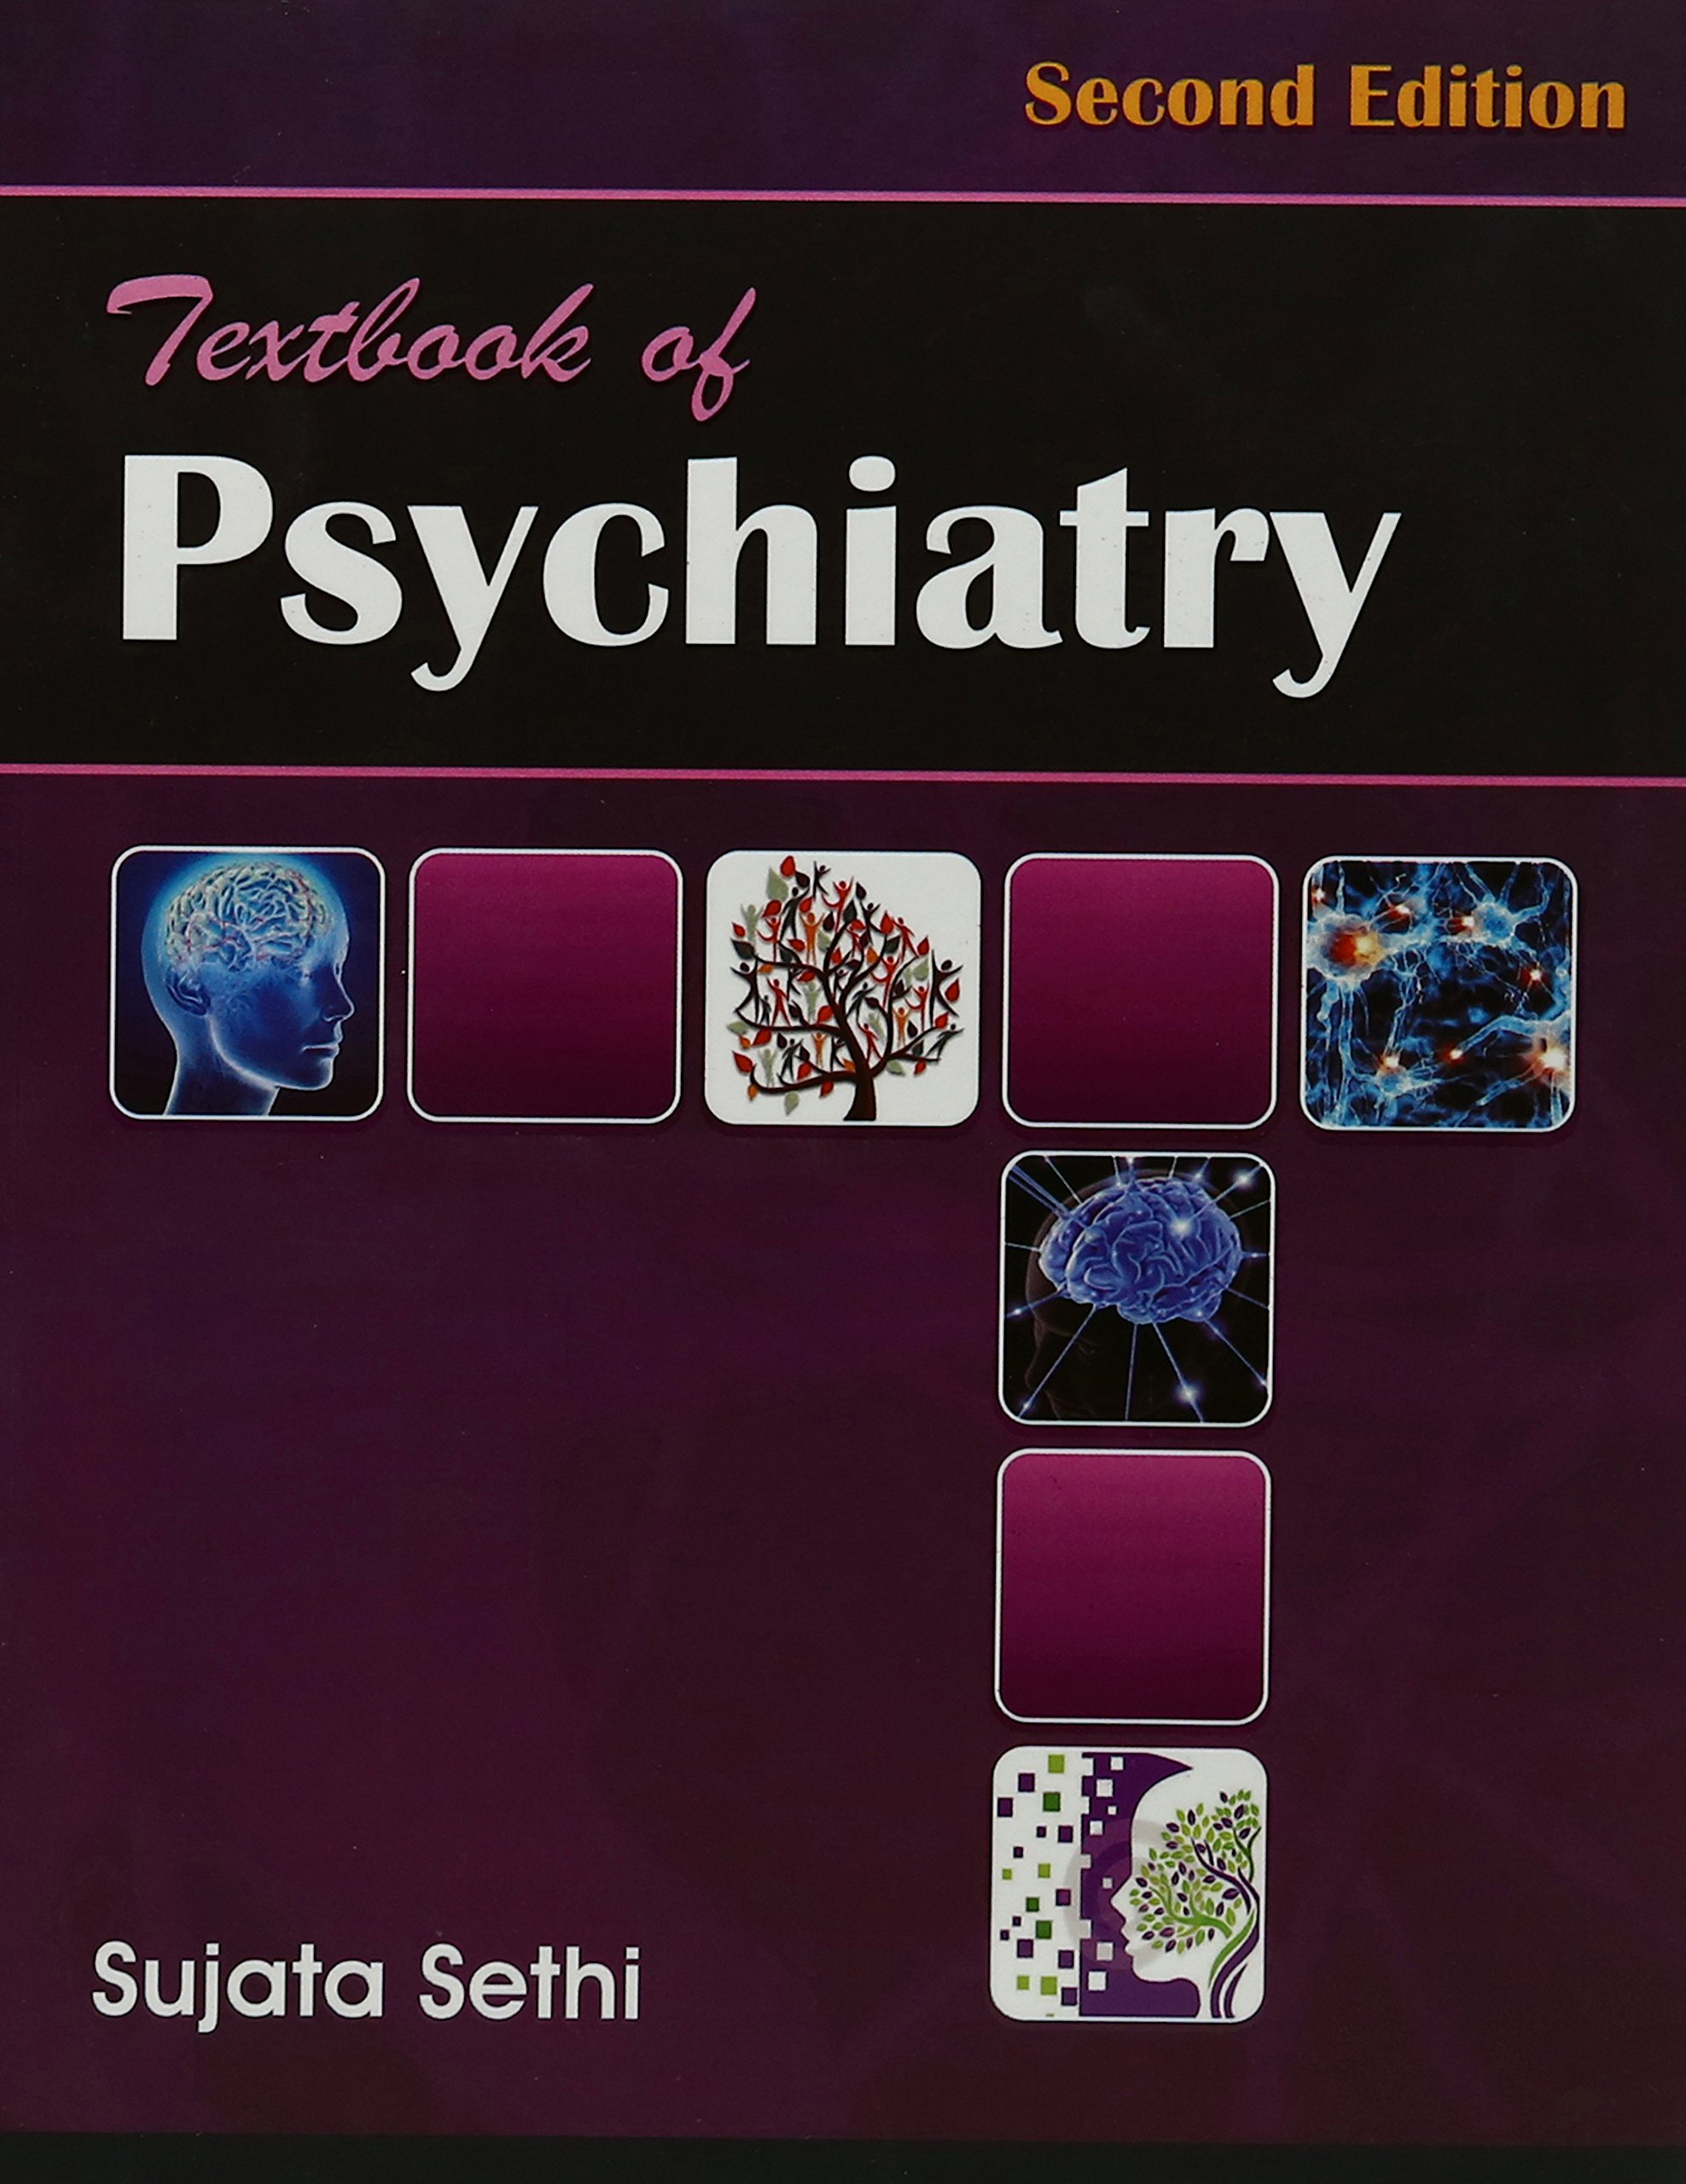 TEXTBOOK OF PSYCHIATRY 2/E2016